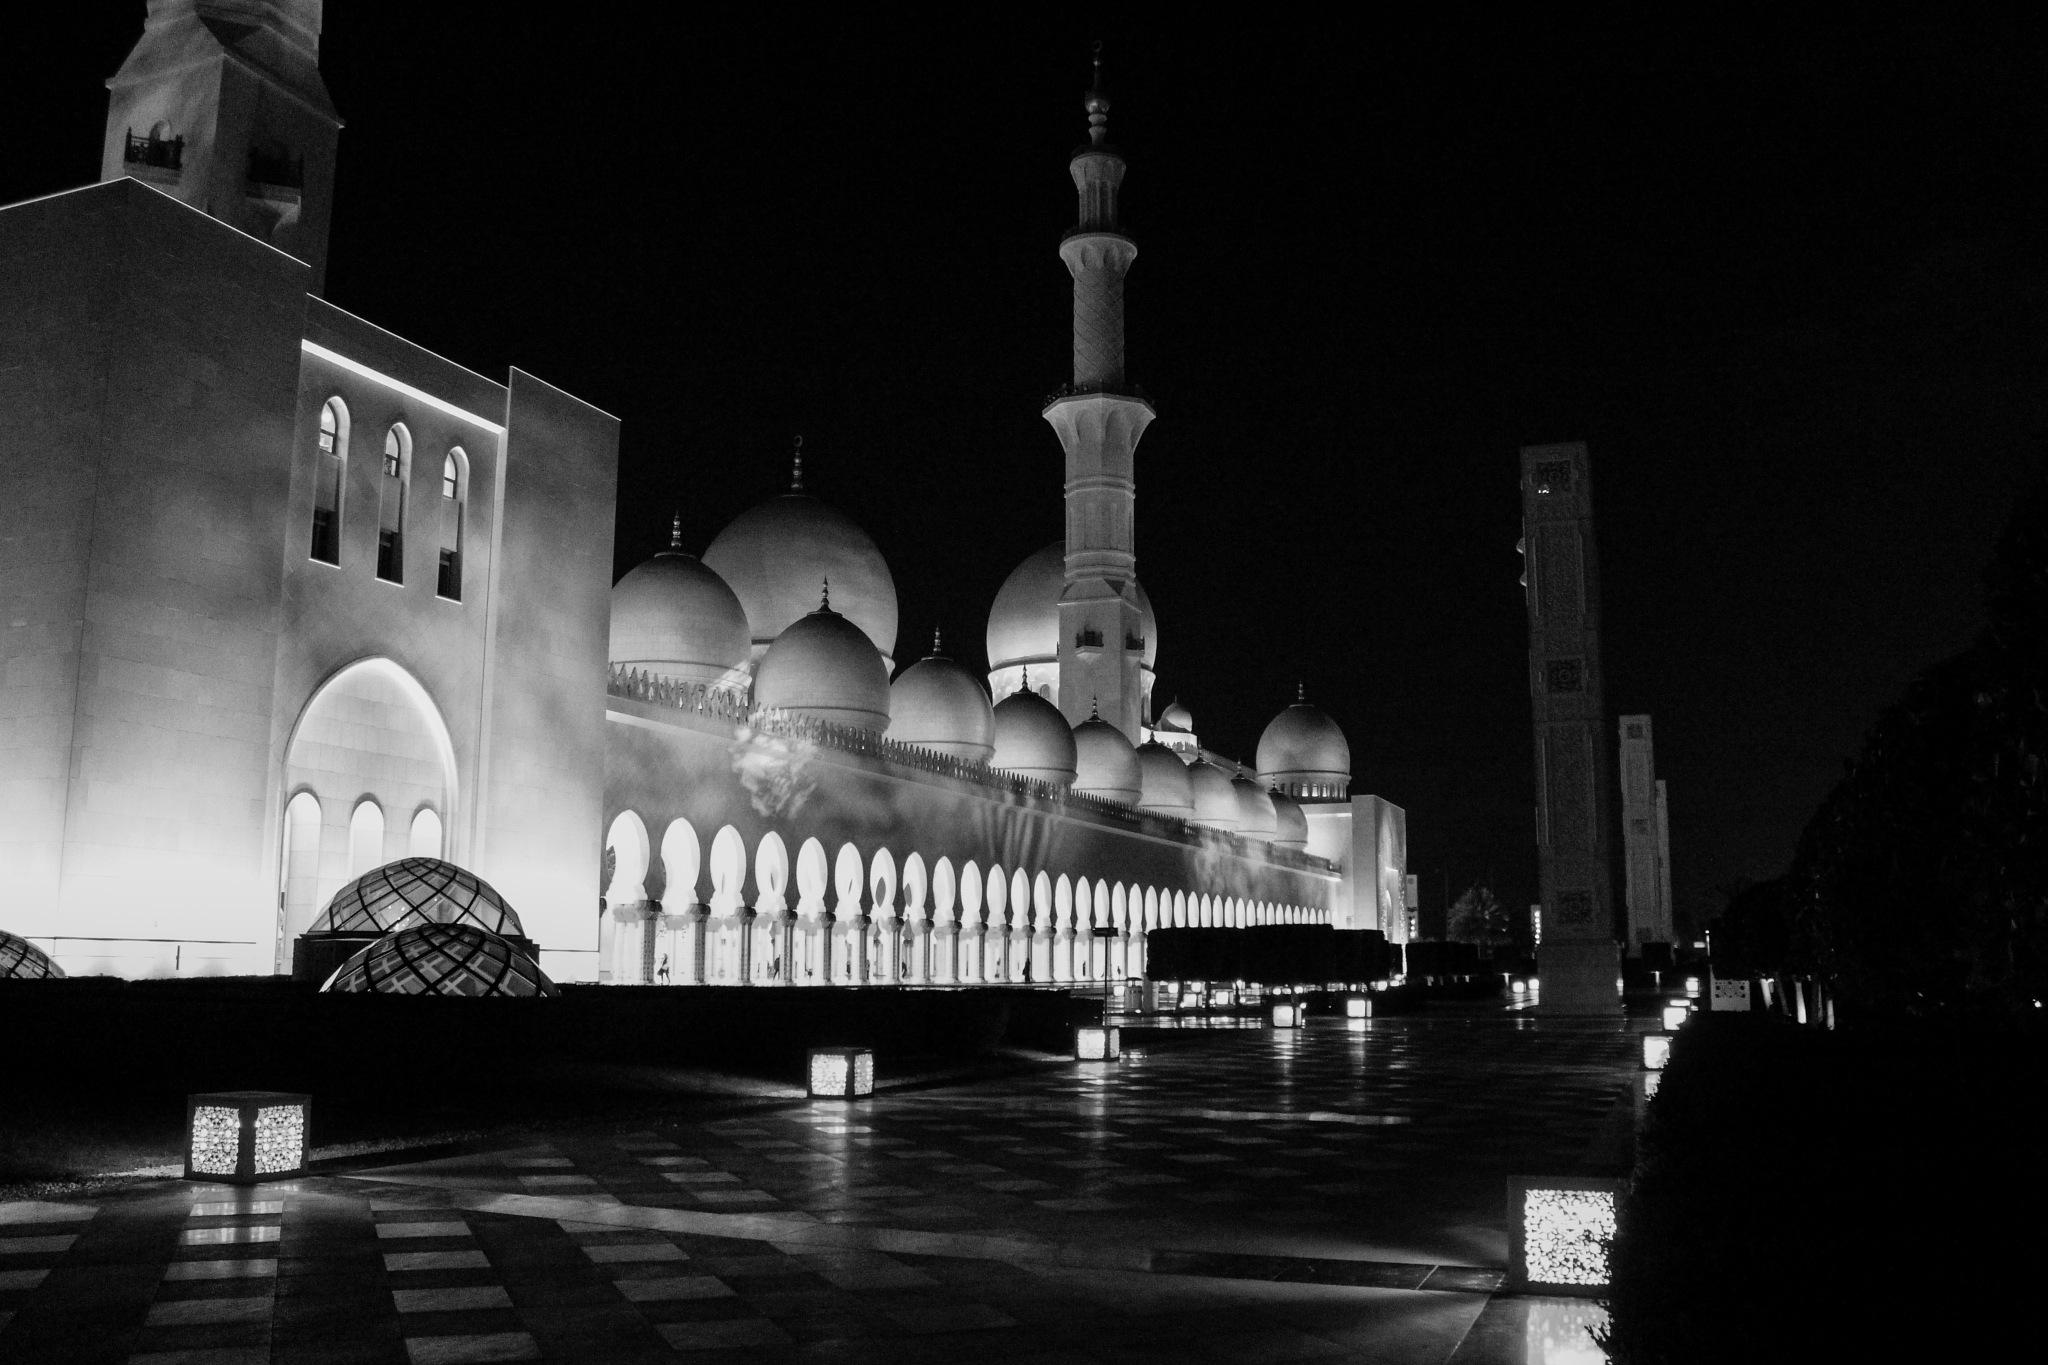 A beautiful mosque - Abu Dhabi by Tanveer Bhurani